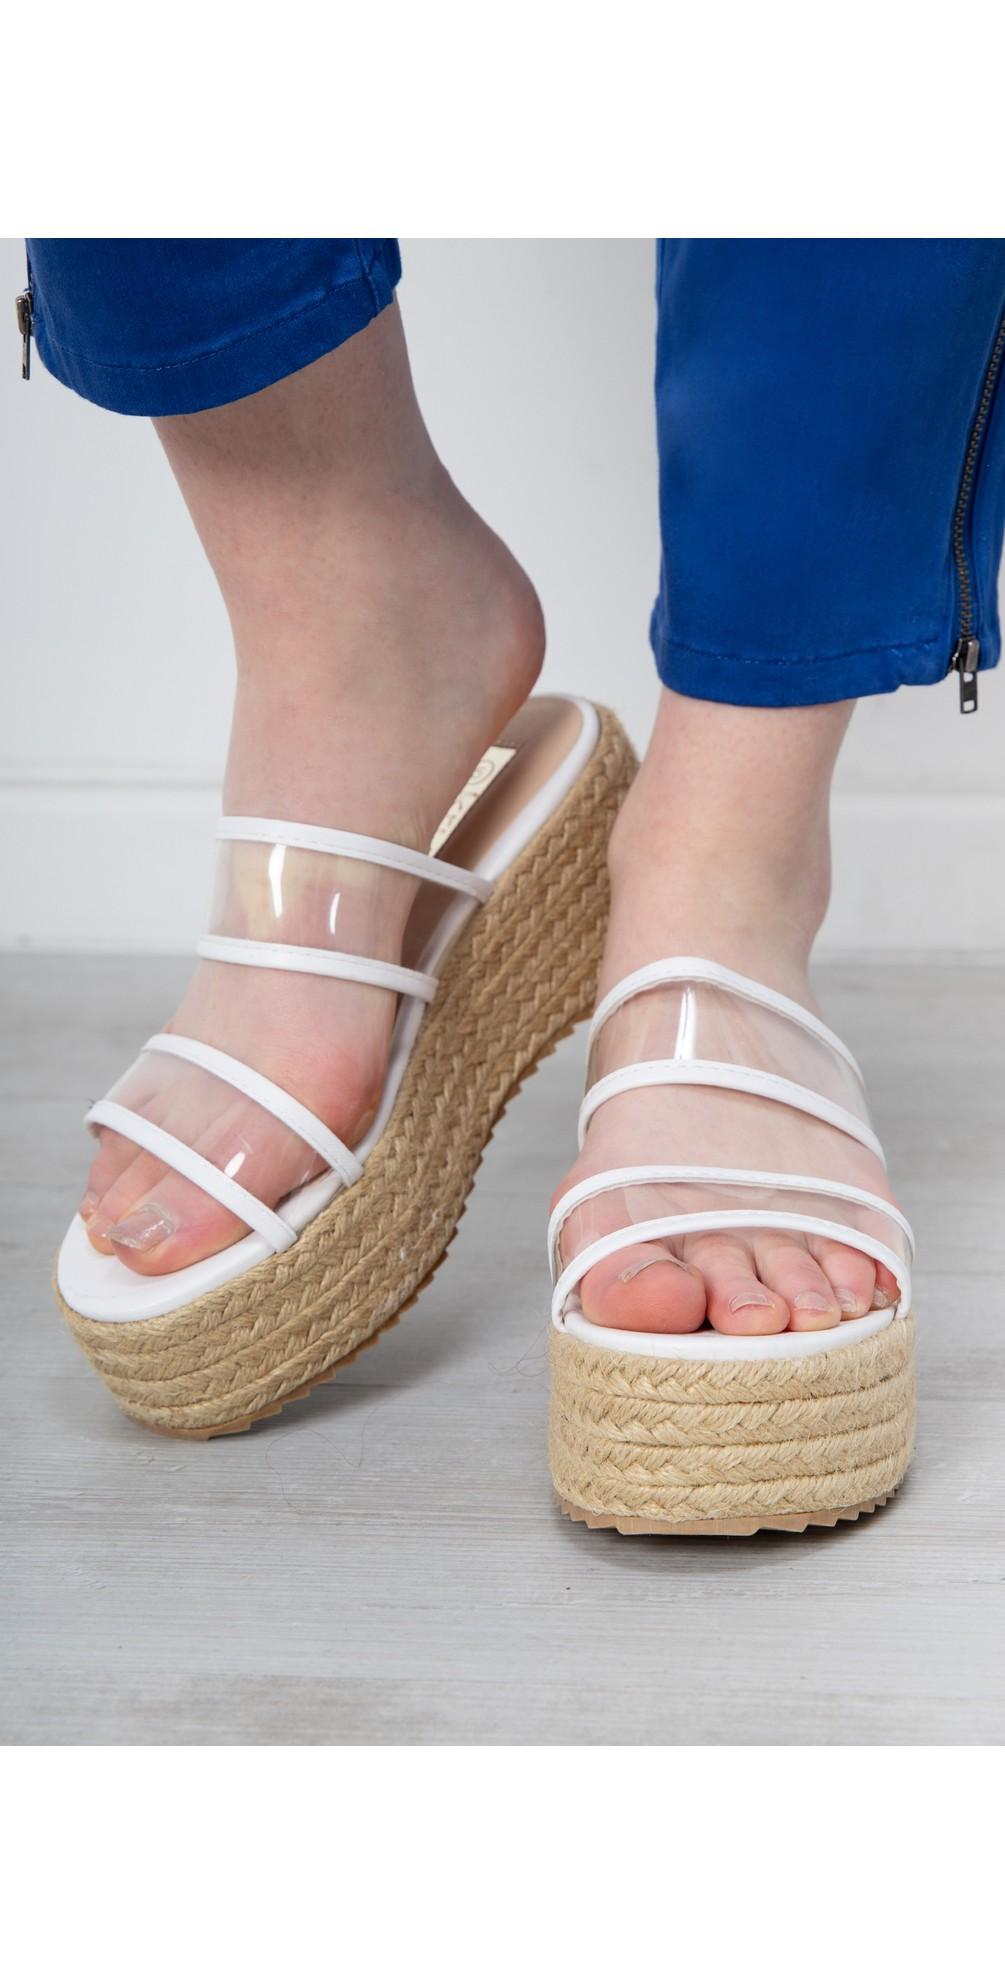 Positano Wedge Sandal main image